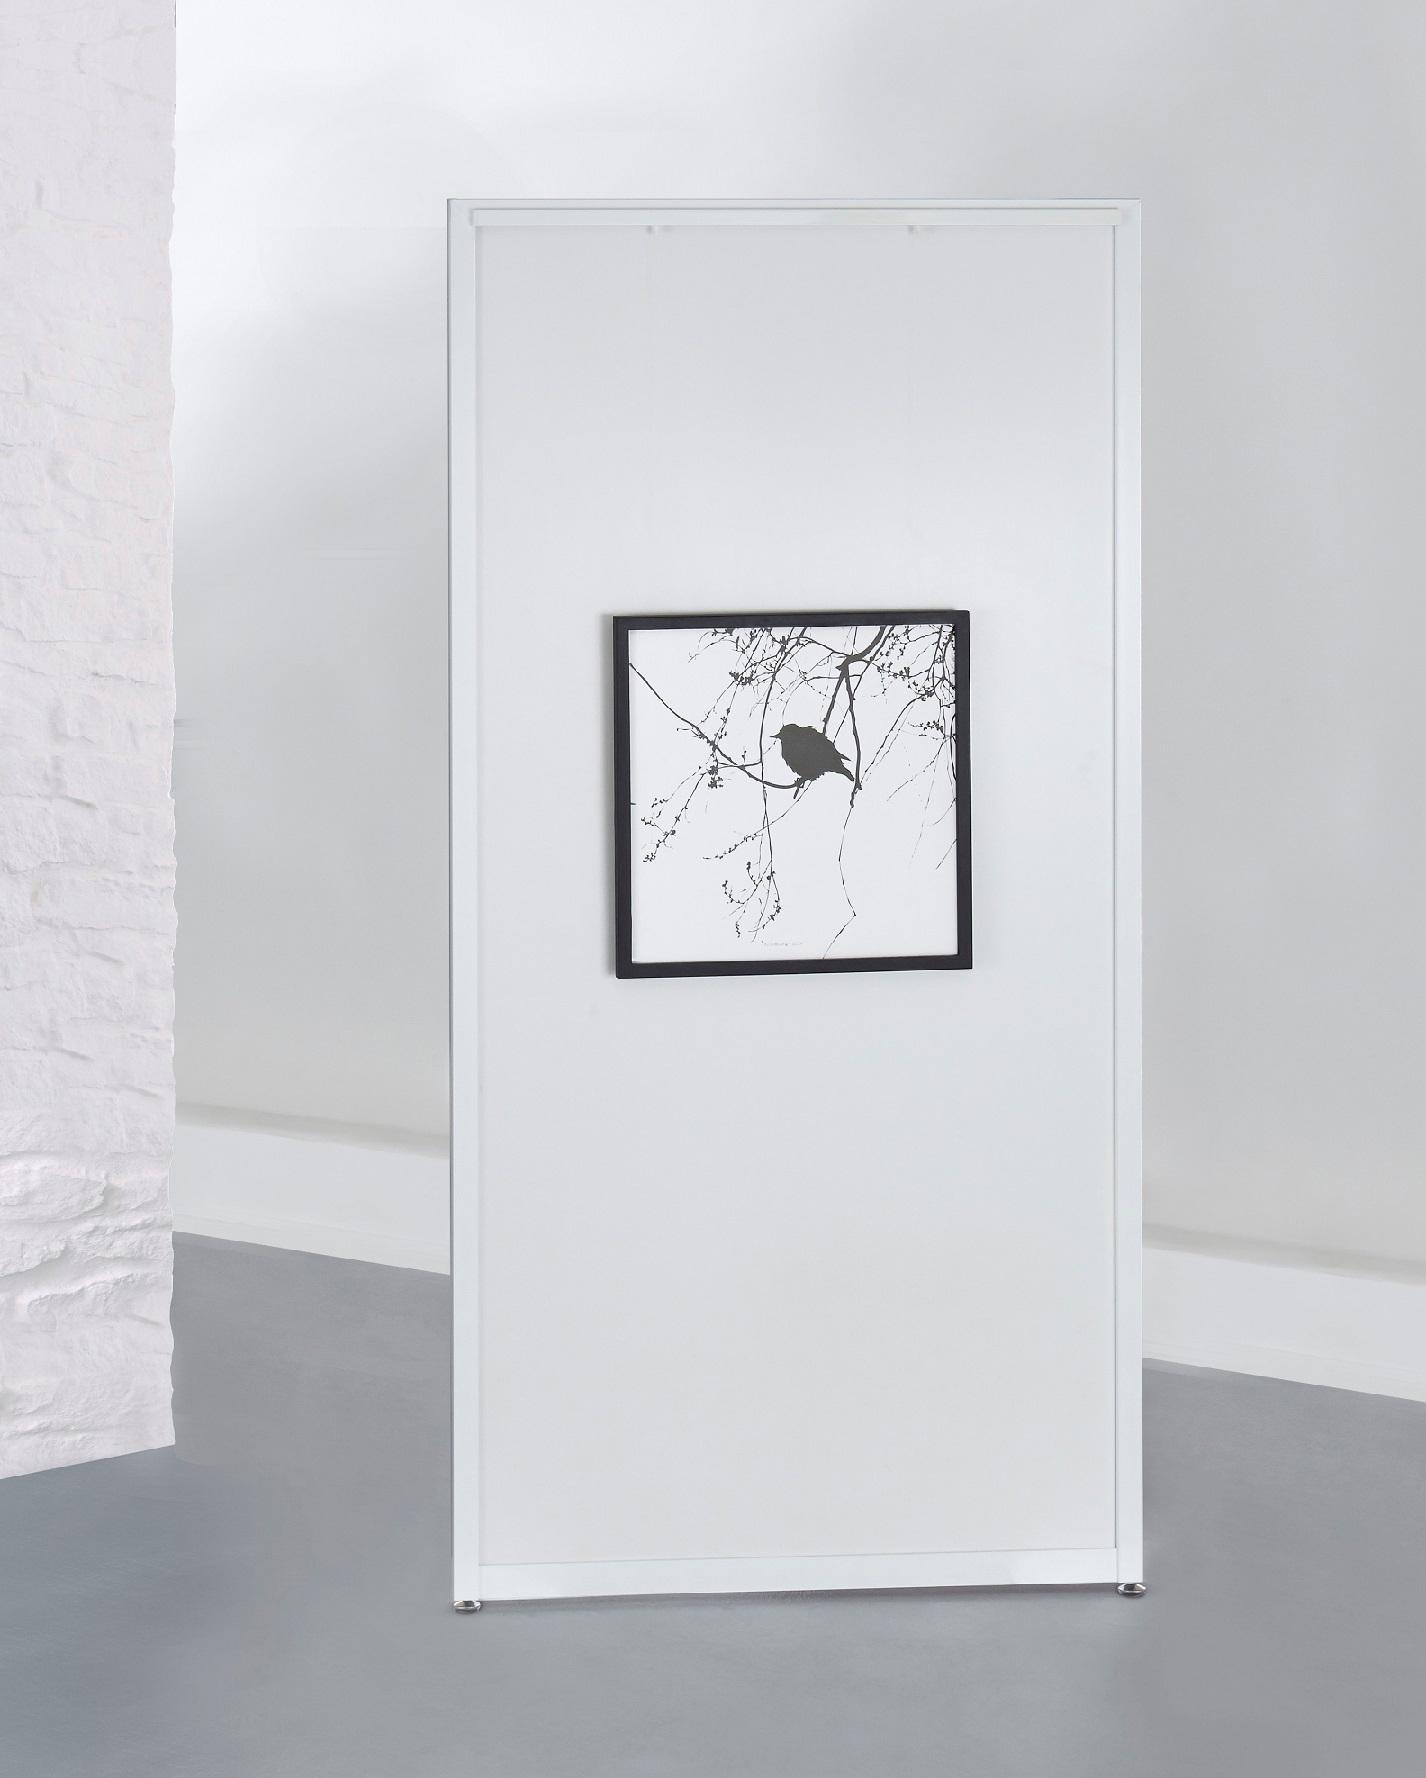 Weißes Stellwandmodul 'Screen Art', Dekorplatte mit den Maßen 100 x 198 cm